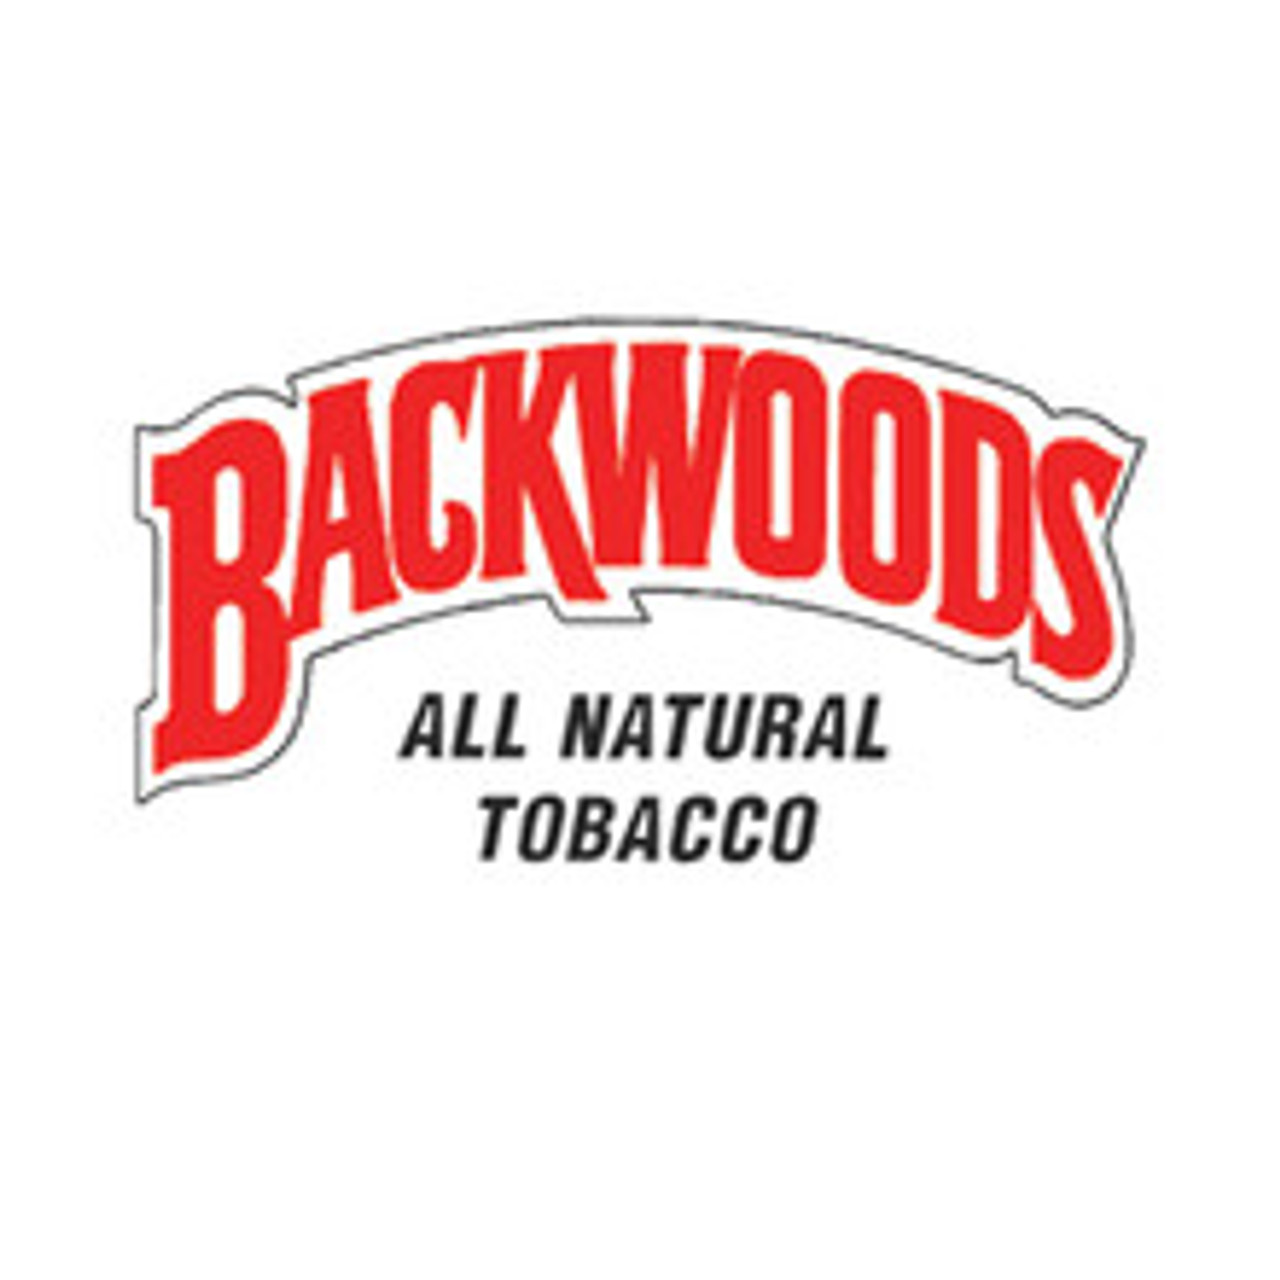 Backwoods Sweet Cigars (8 Packs of 5) - Natural